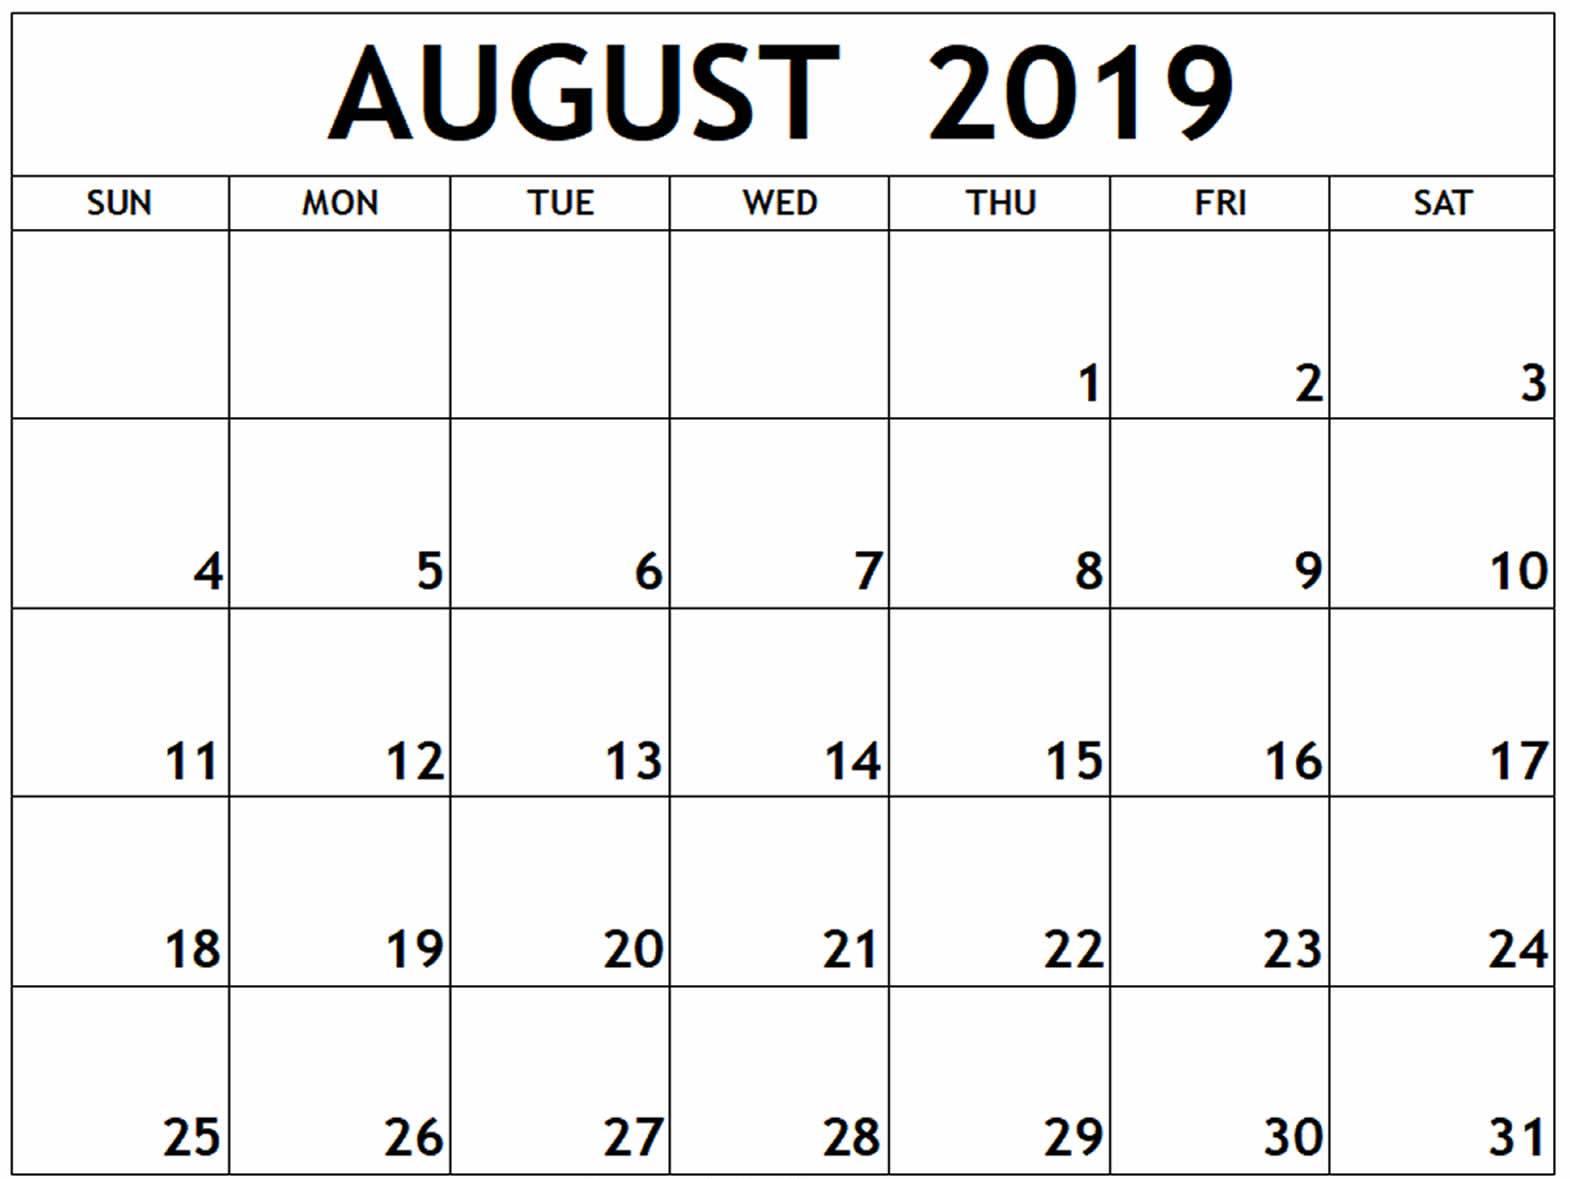 August 2019 Calendar Printable - Free August 2019 Calendar Printable with Pretty Blank Augst Calender